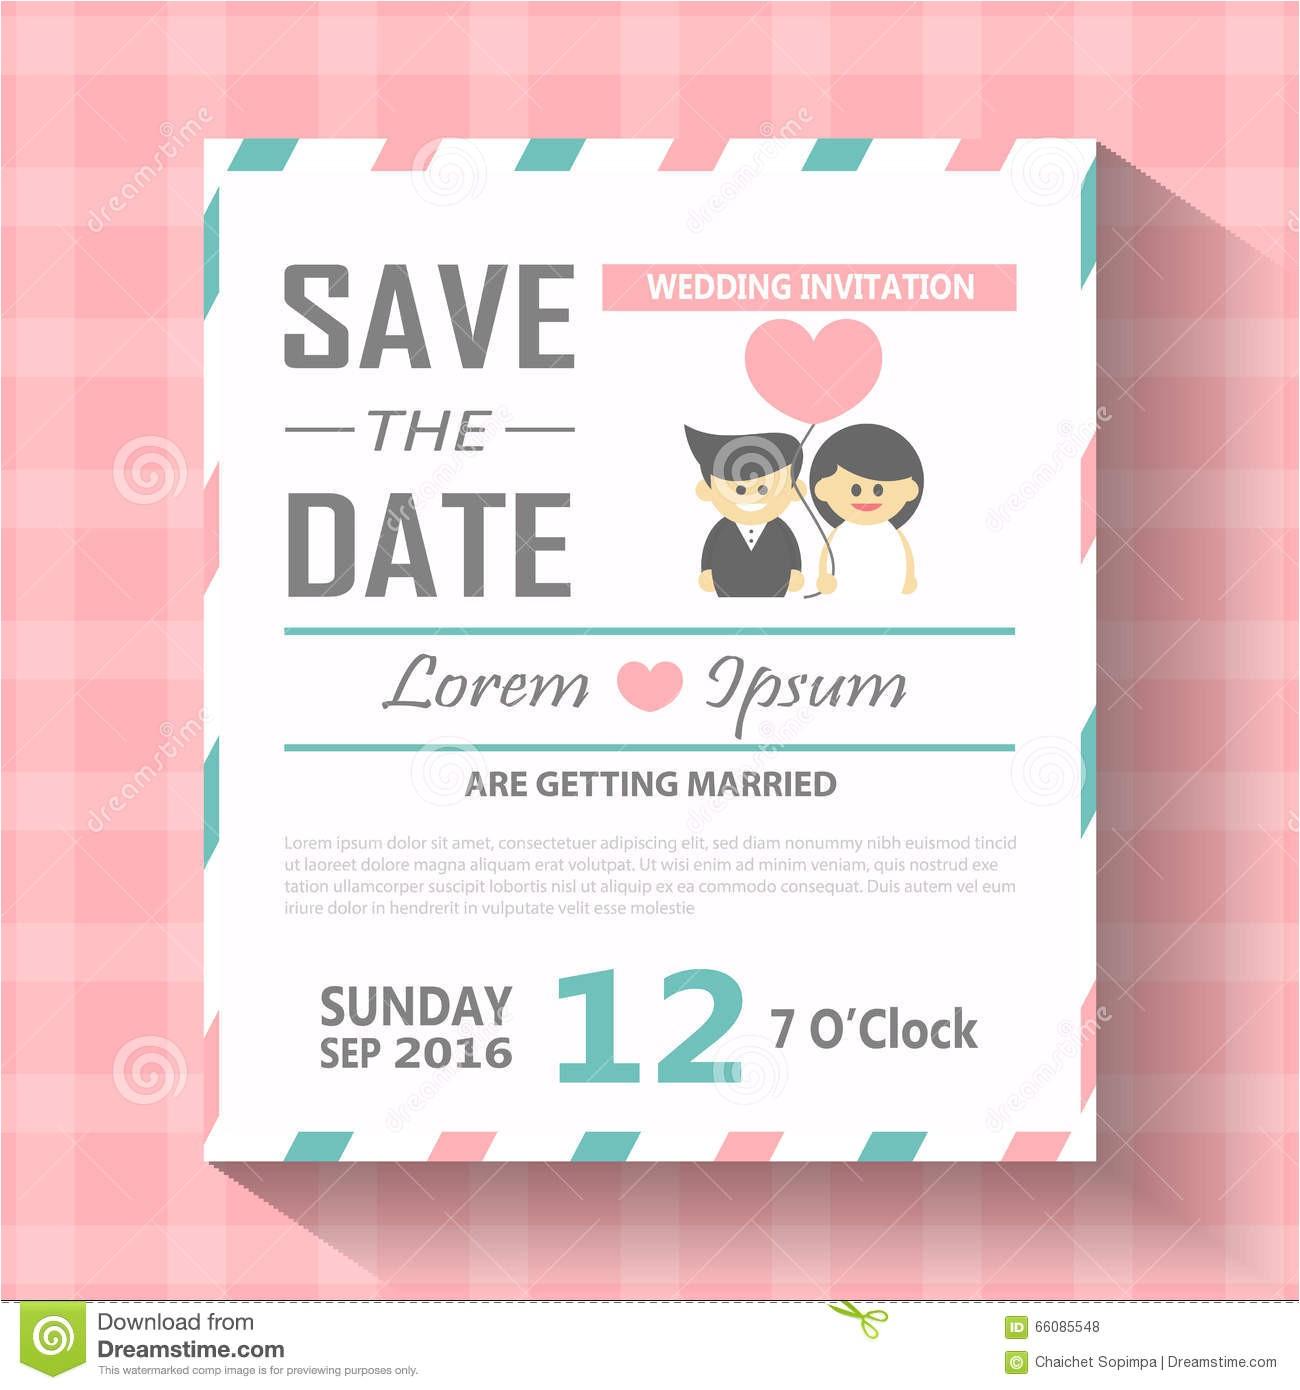 stock illustration wedding invitation card template vector illustration wedding invitation card editable background chevron font type save image66085548